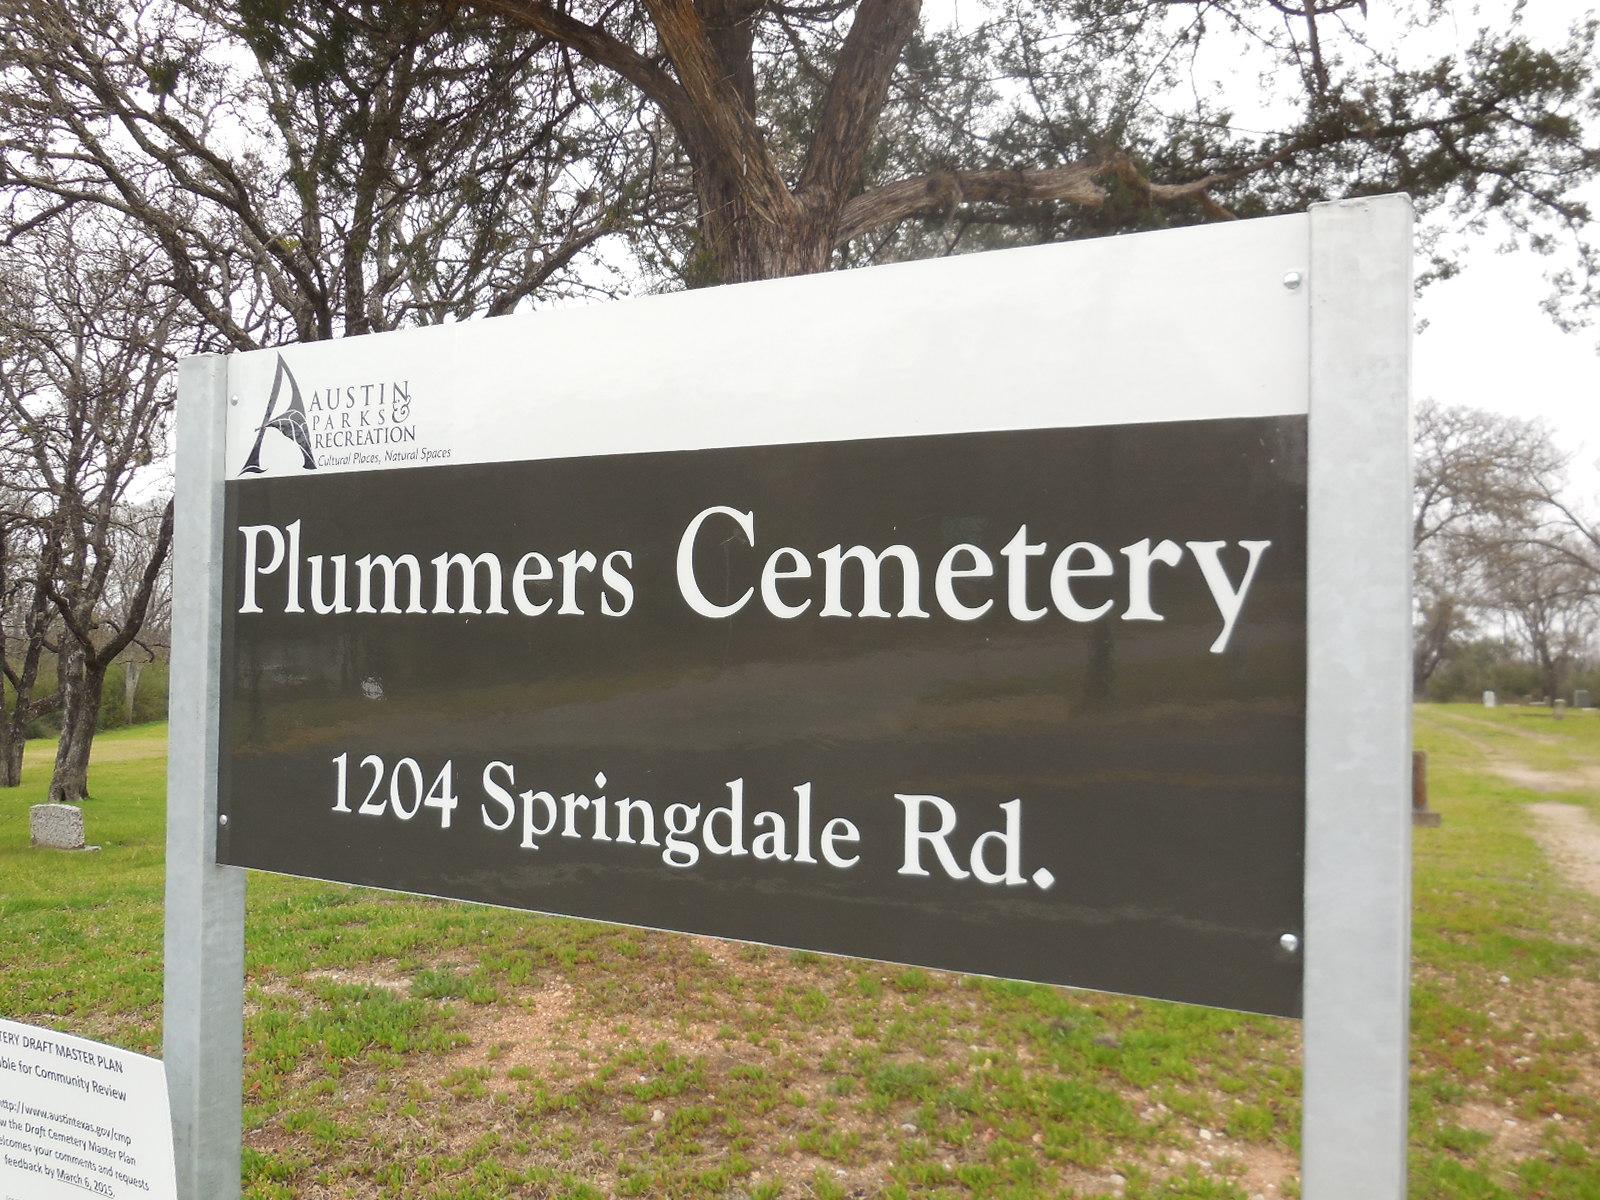 Plummers Cemetery